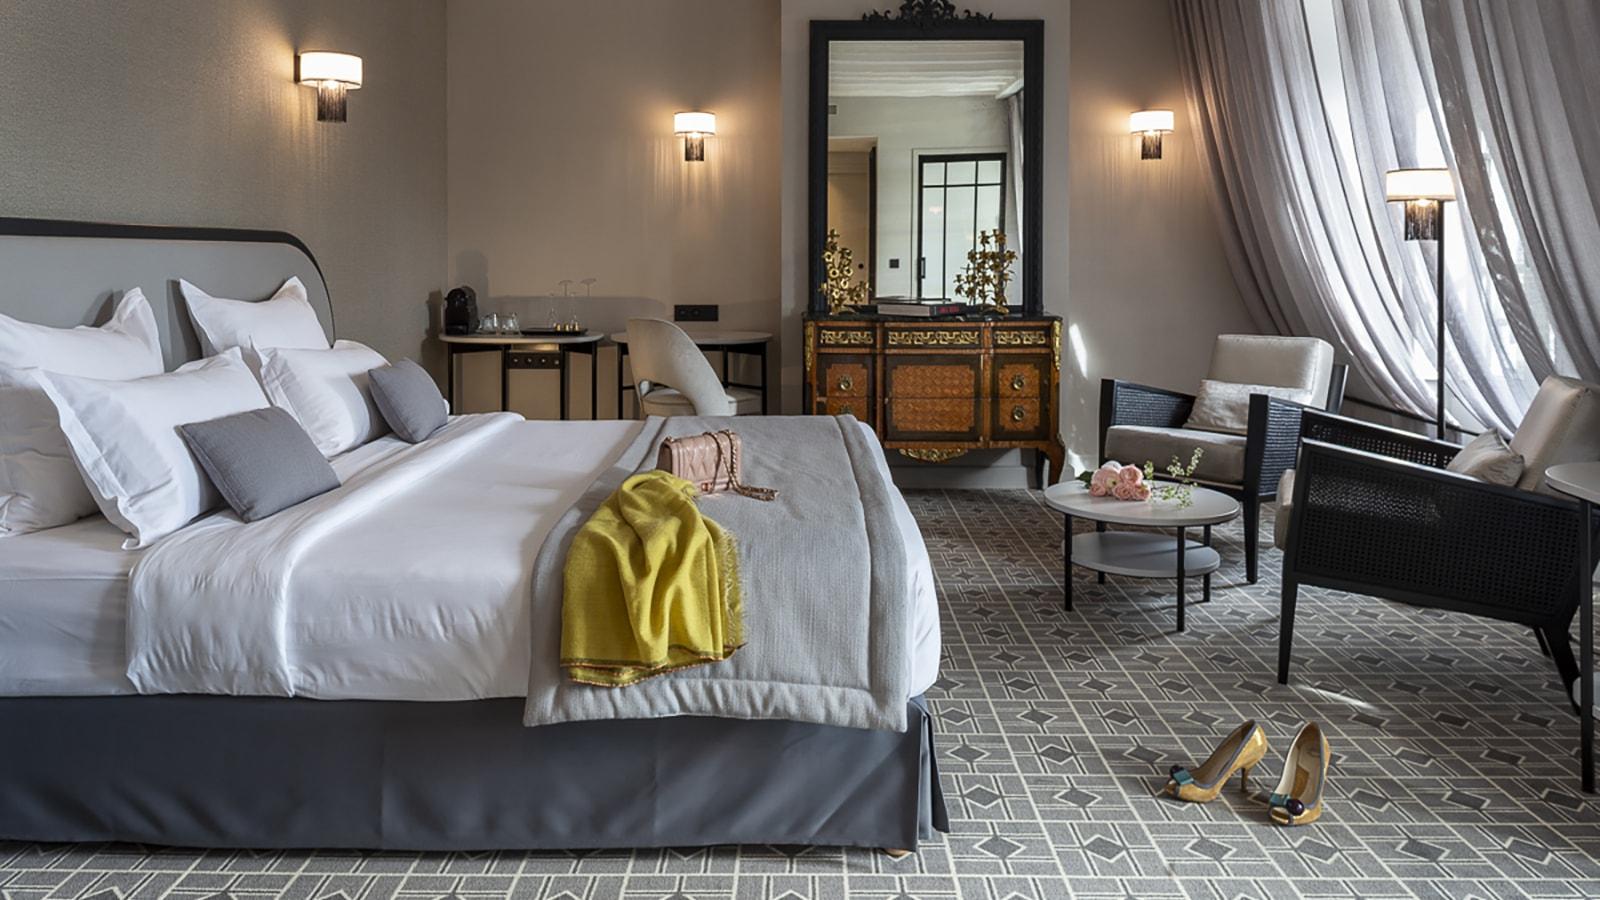 EFI Design Hotel Lenox Paris Efi Design (5) 1159